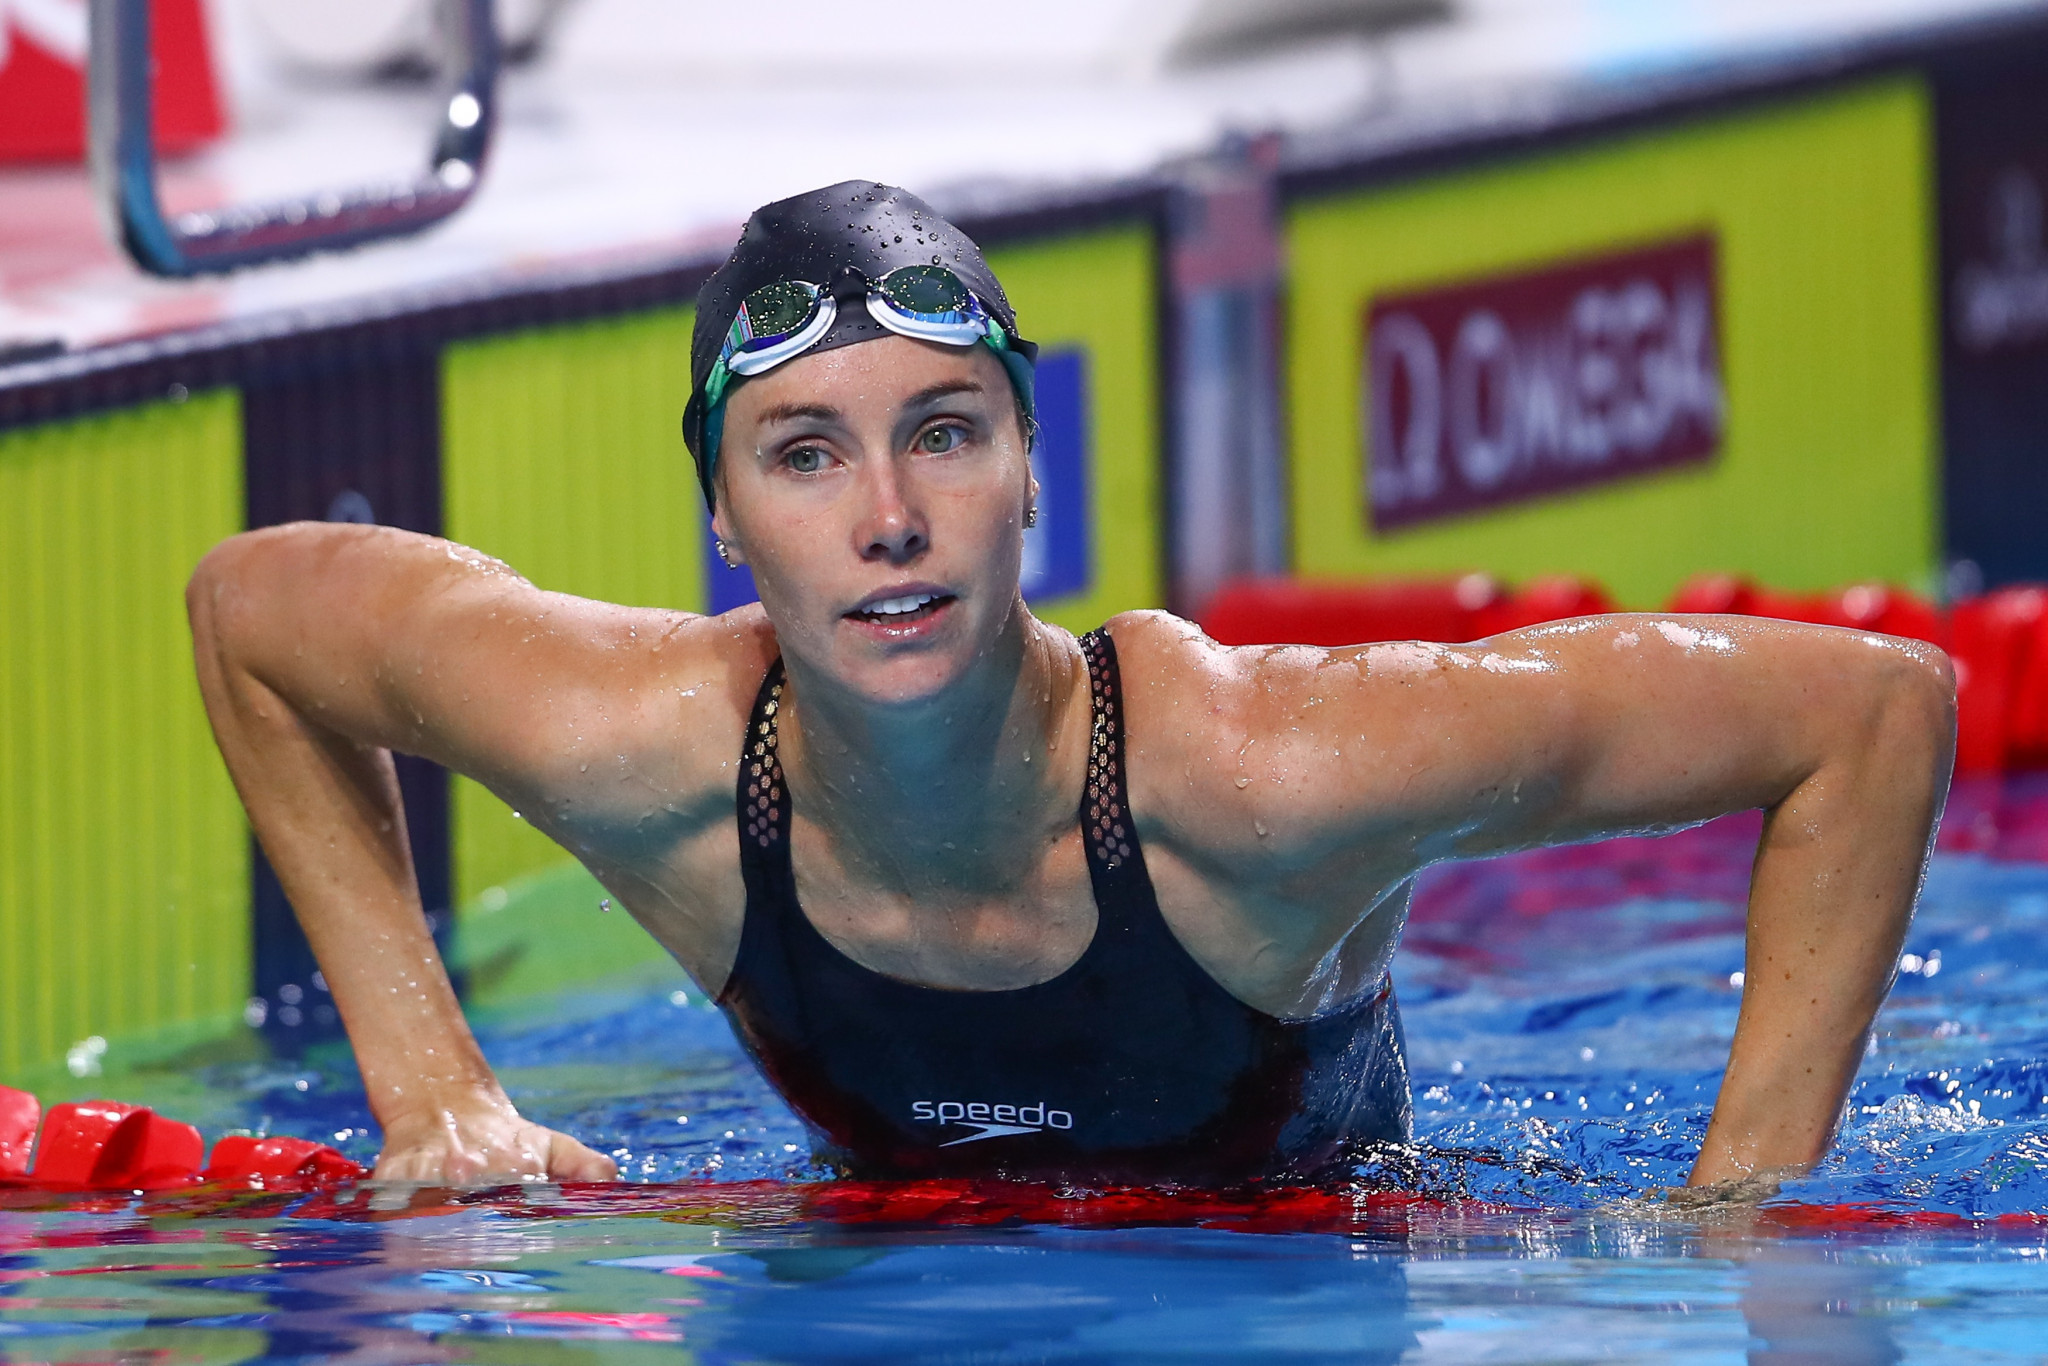 Kazan to host final leg of FINA Swimming World Cup as McKeon and Sates eye glory